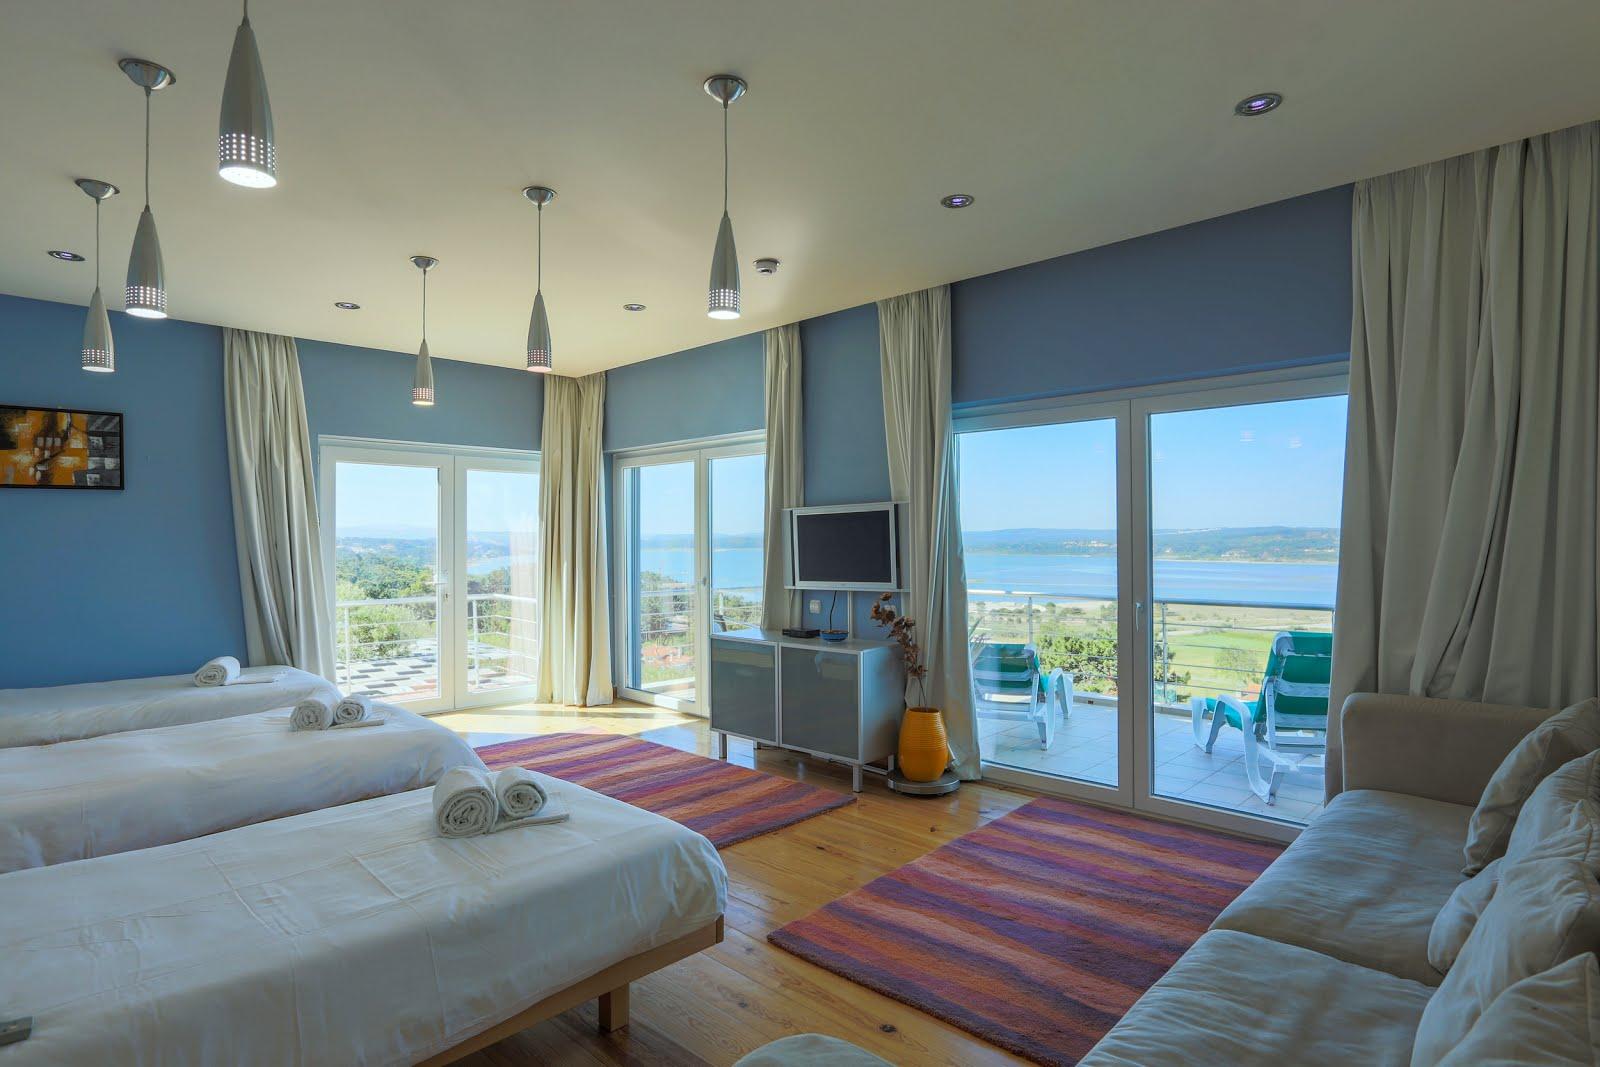 One bedroom, large balcony